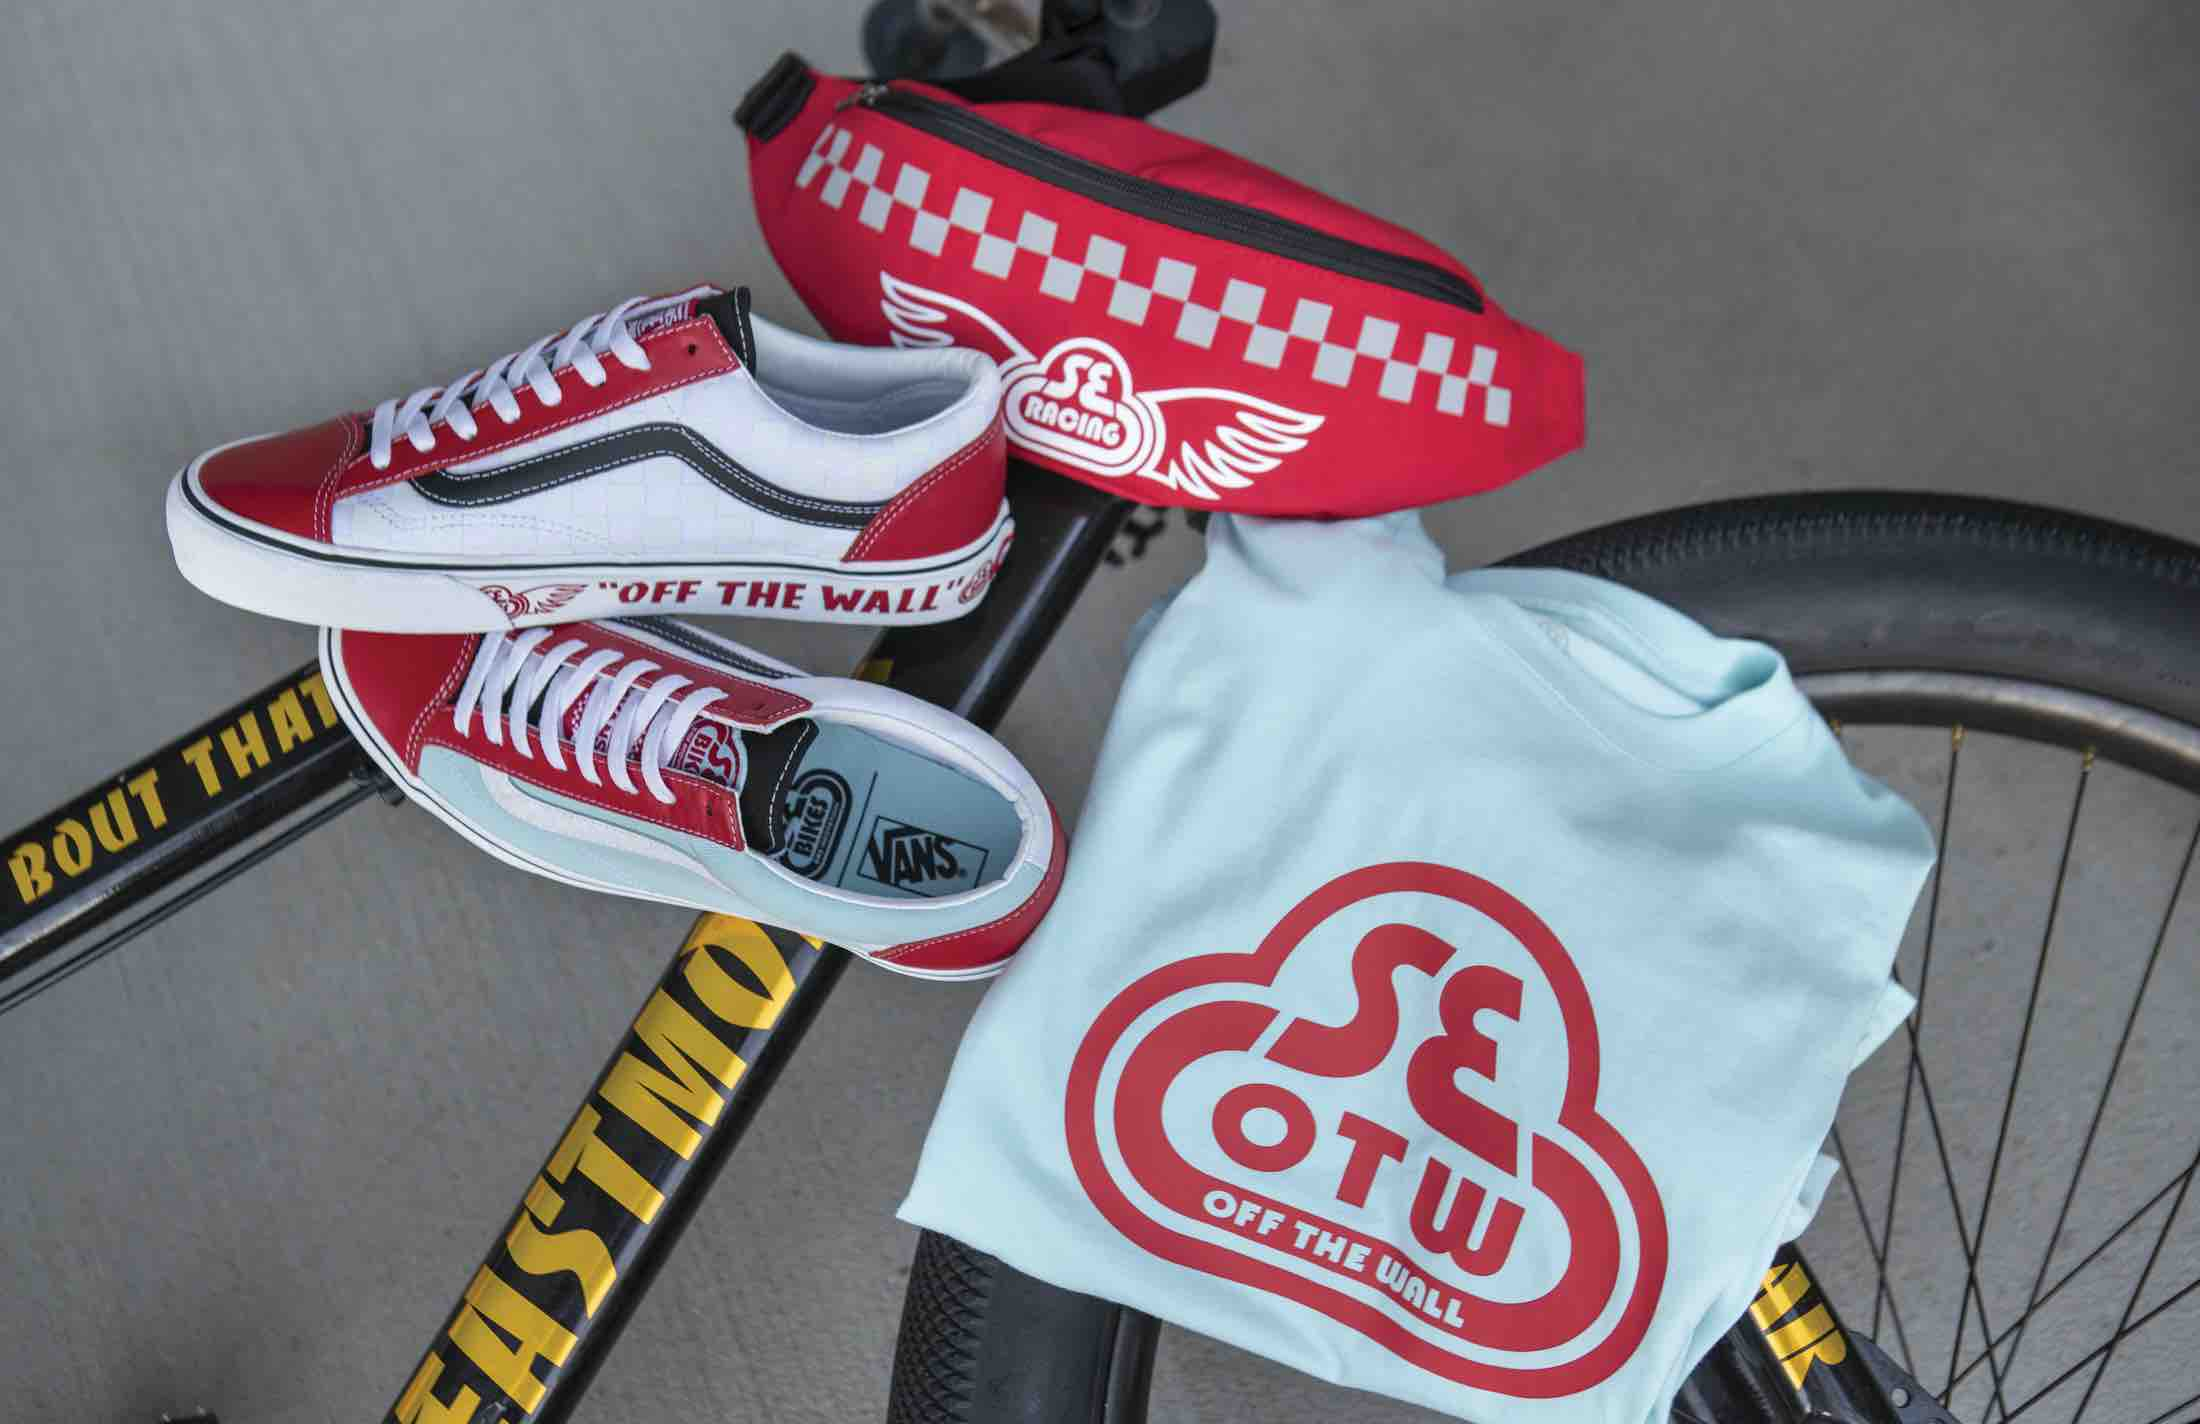 New Release Collab Vans x SE Bikes, Your New Biker's Style!